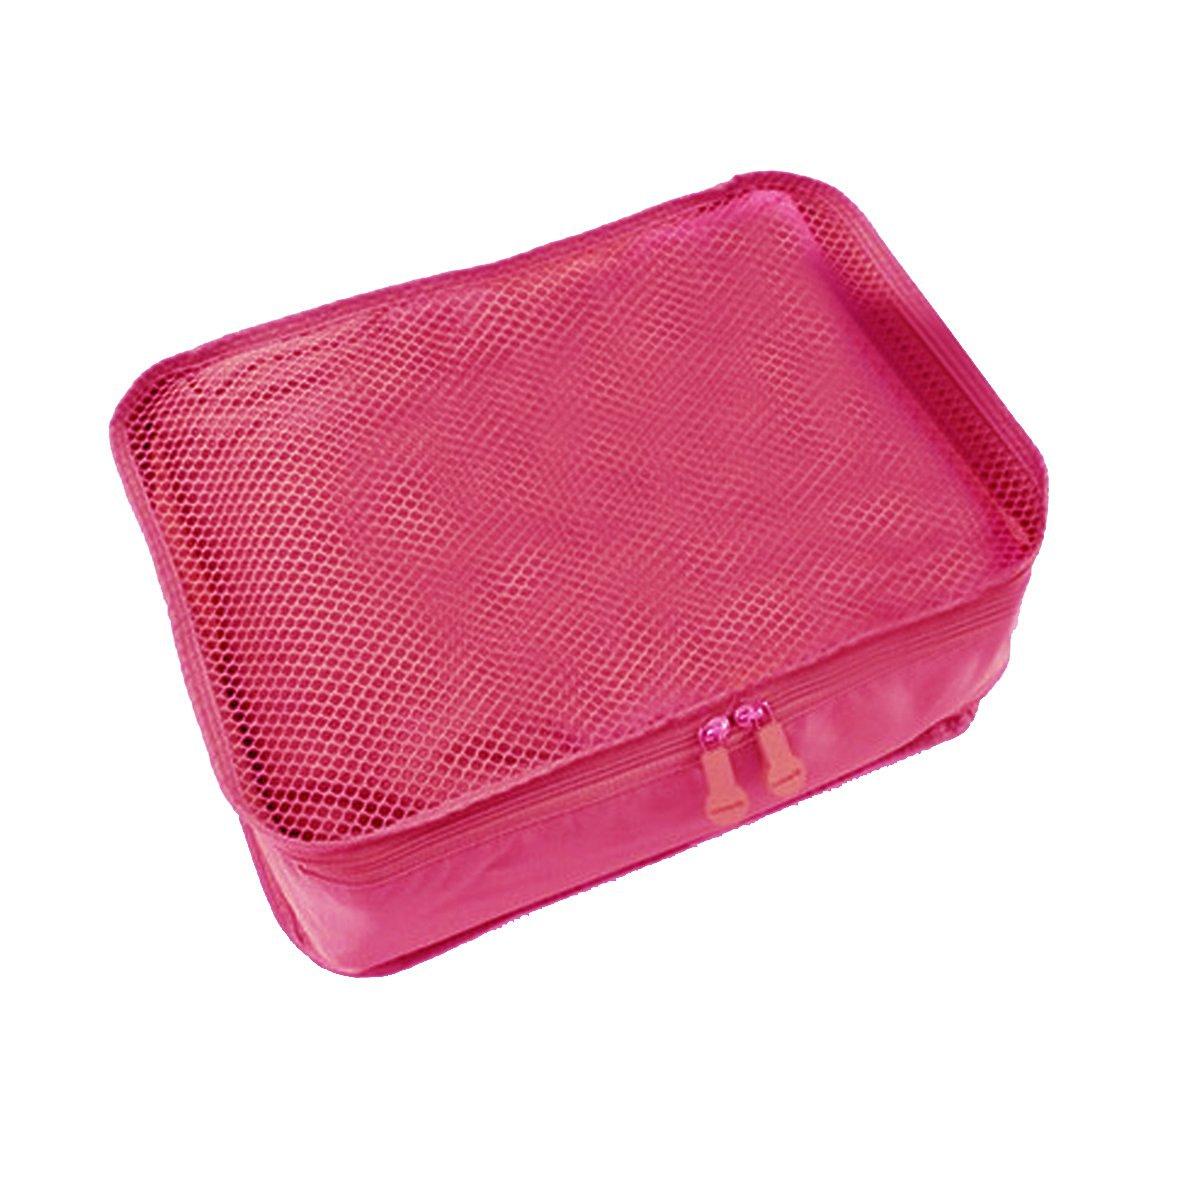 DEHANG Waterproof Nylon Ventilated Foldable Durable Portable Organiser Storage Bag for Travel - Rosy